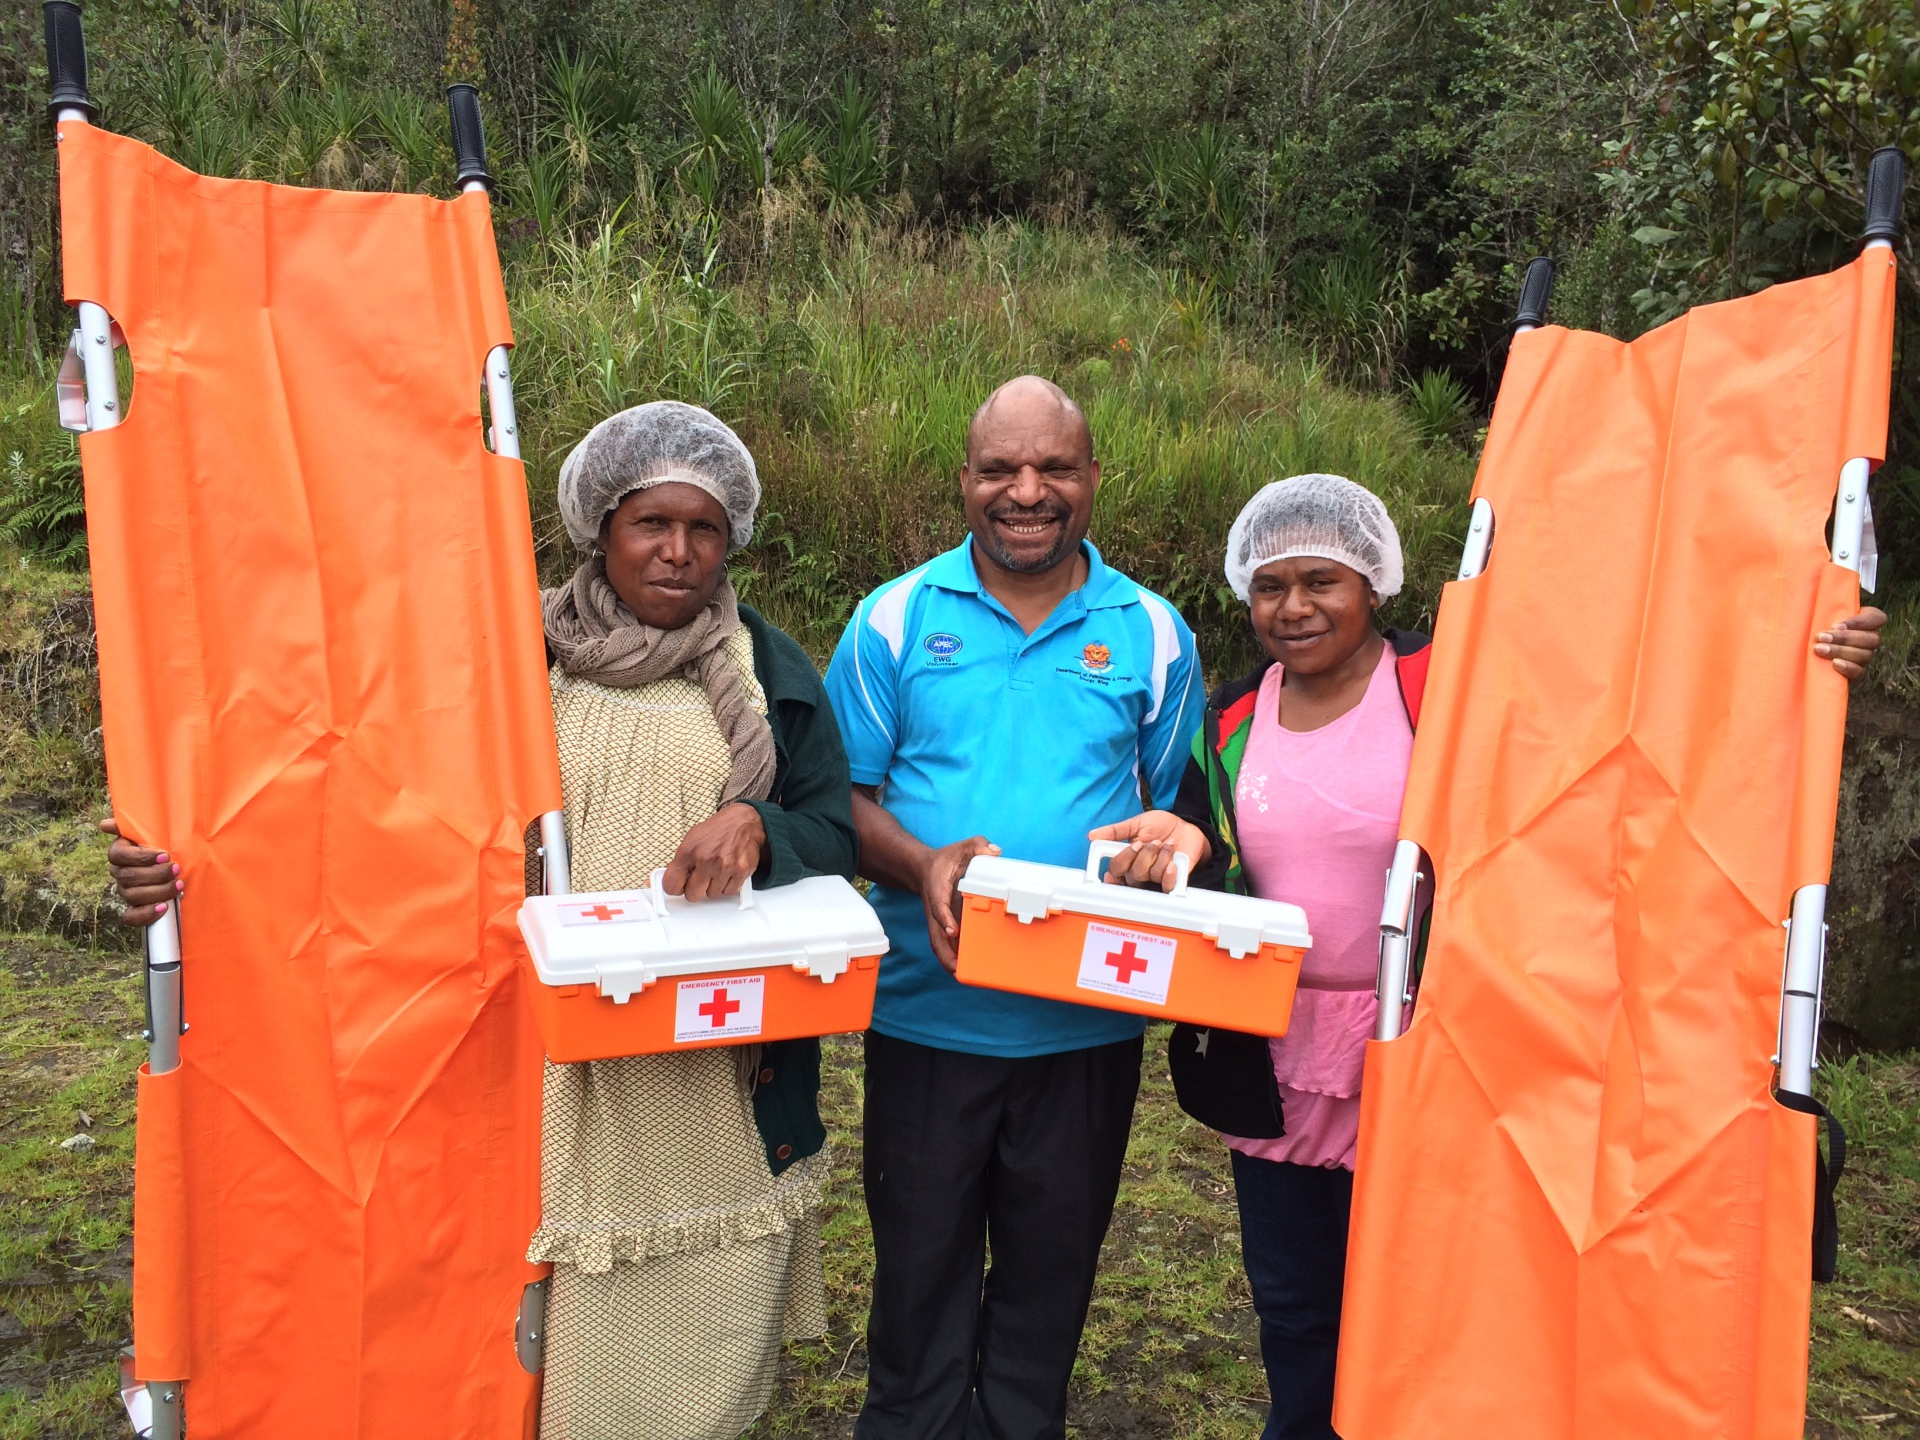 First Aid; Mt Wilhelm; PNG Tourism; Mount Wilhelm; Climbing; Trekking; PNG; Papua New Guinea